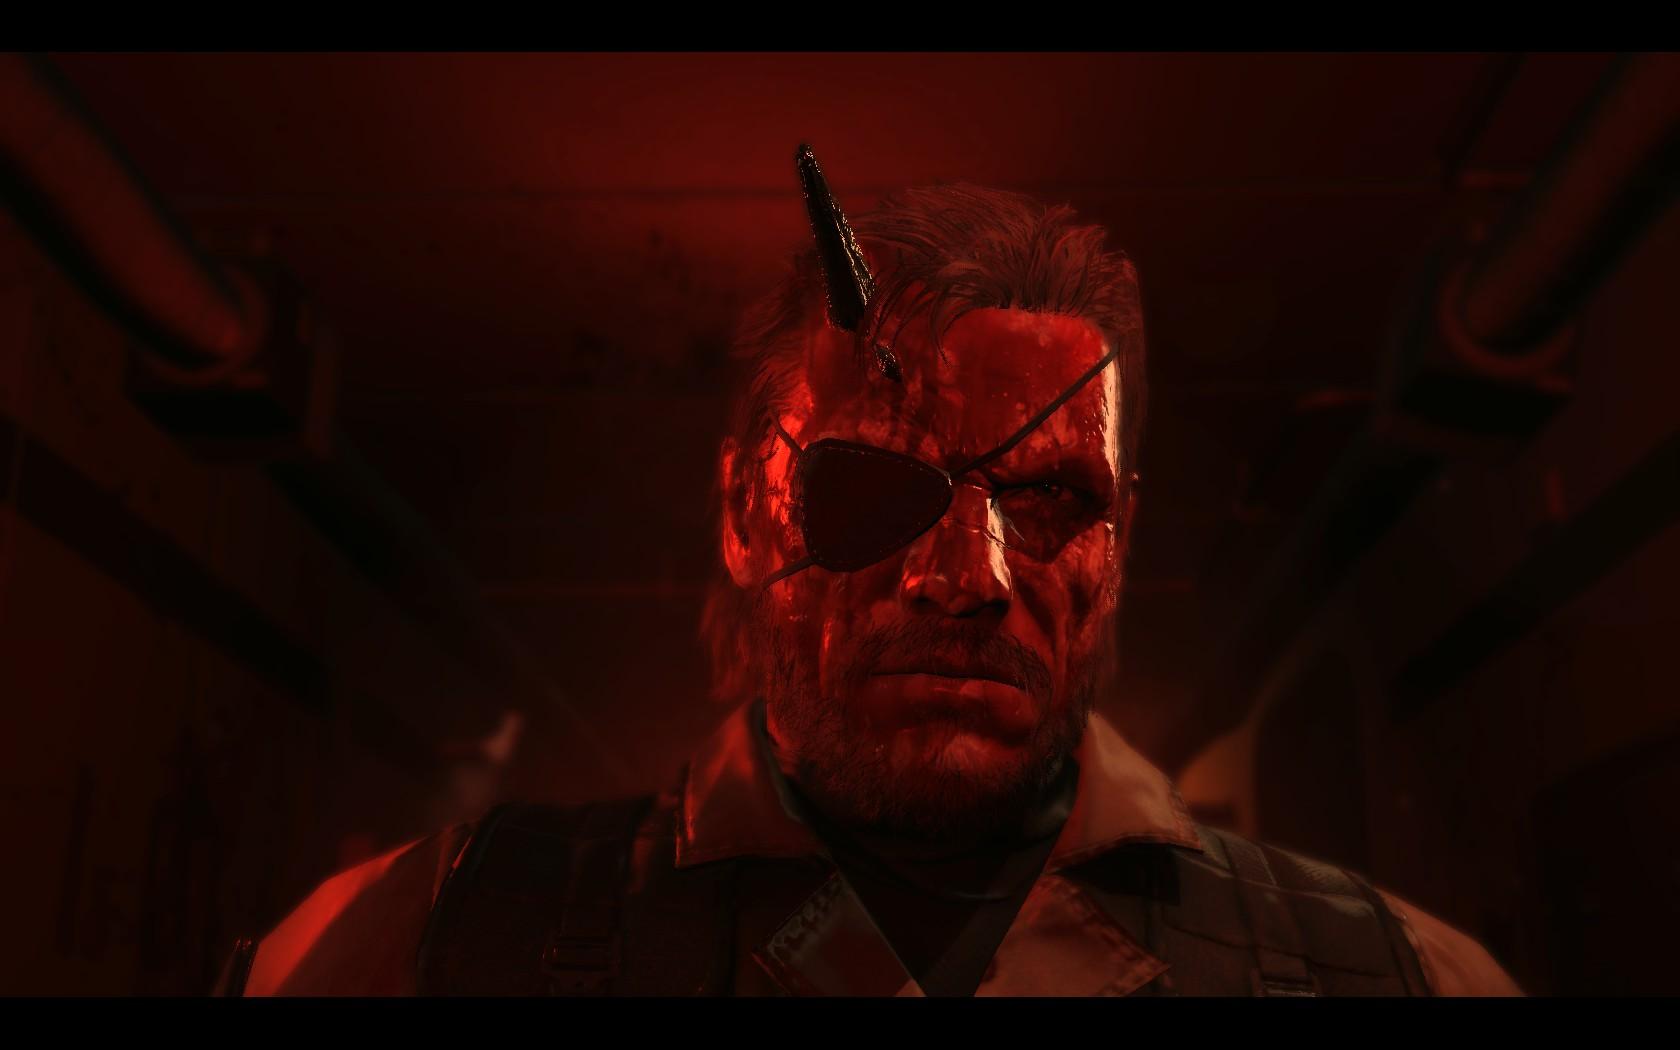 Metal Gear Solid V: The Phantom Pain 113753